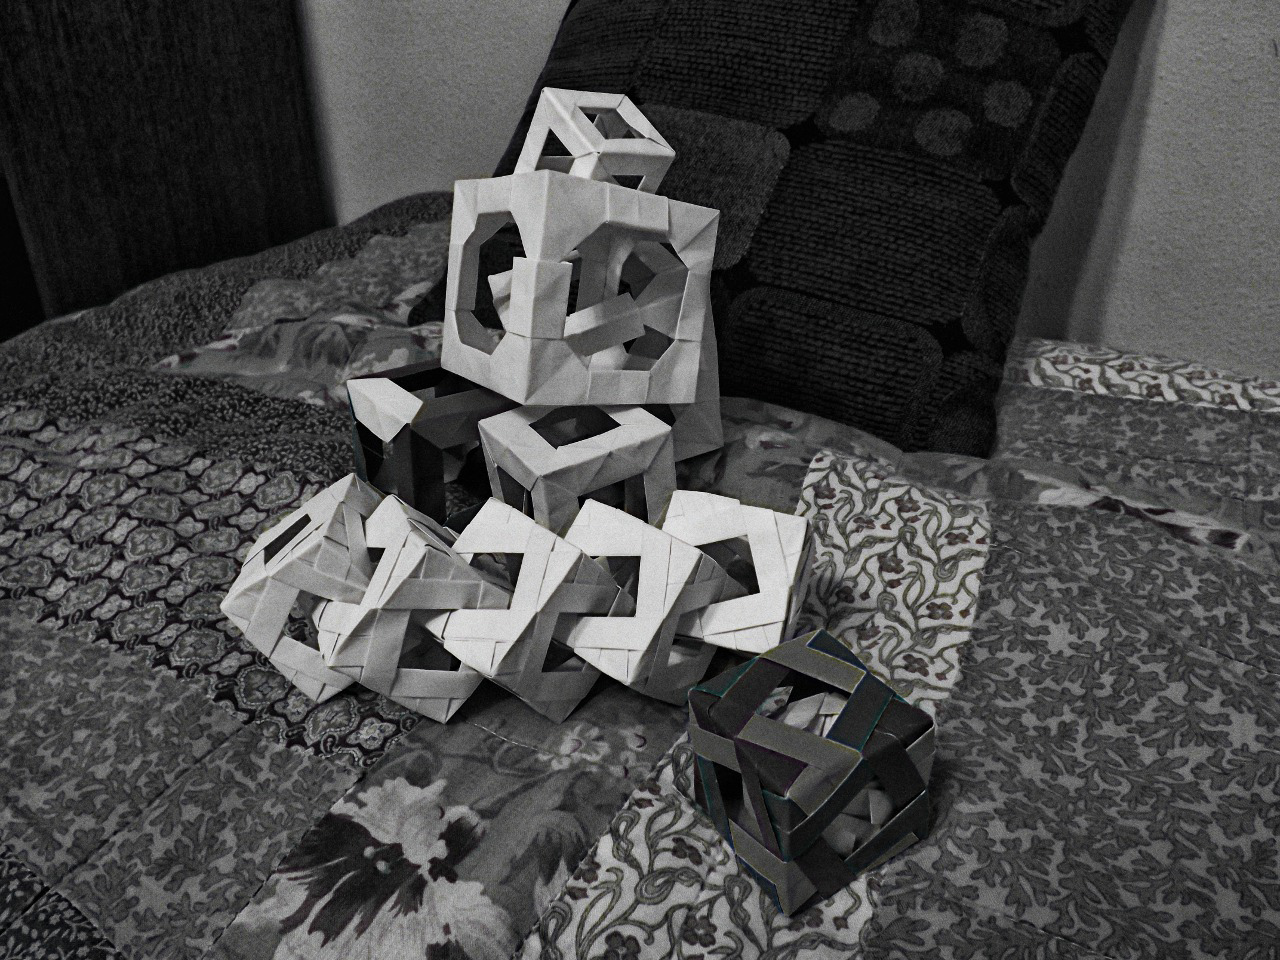 201/365 Georges Braque: Balalajka